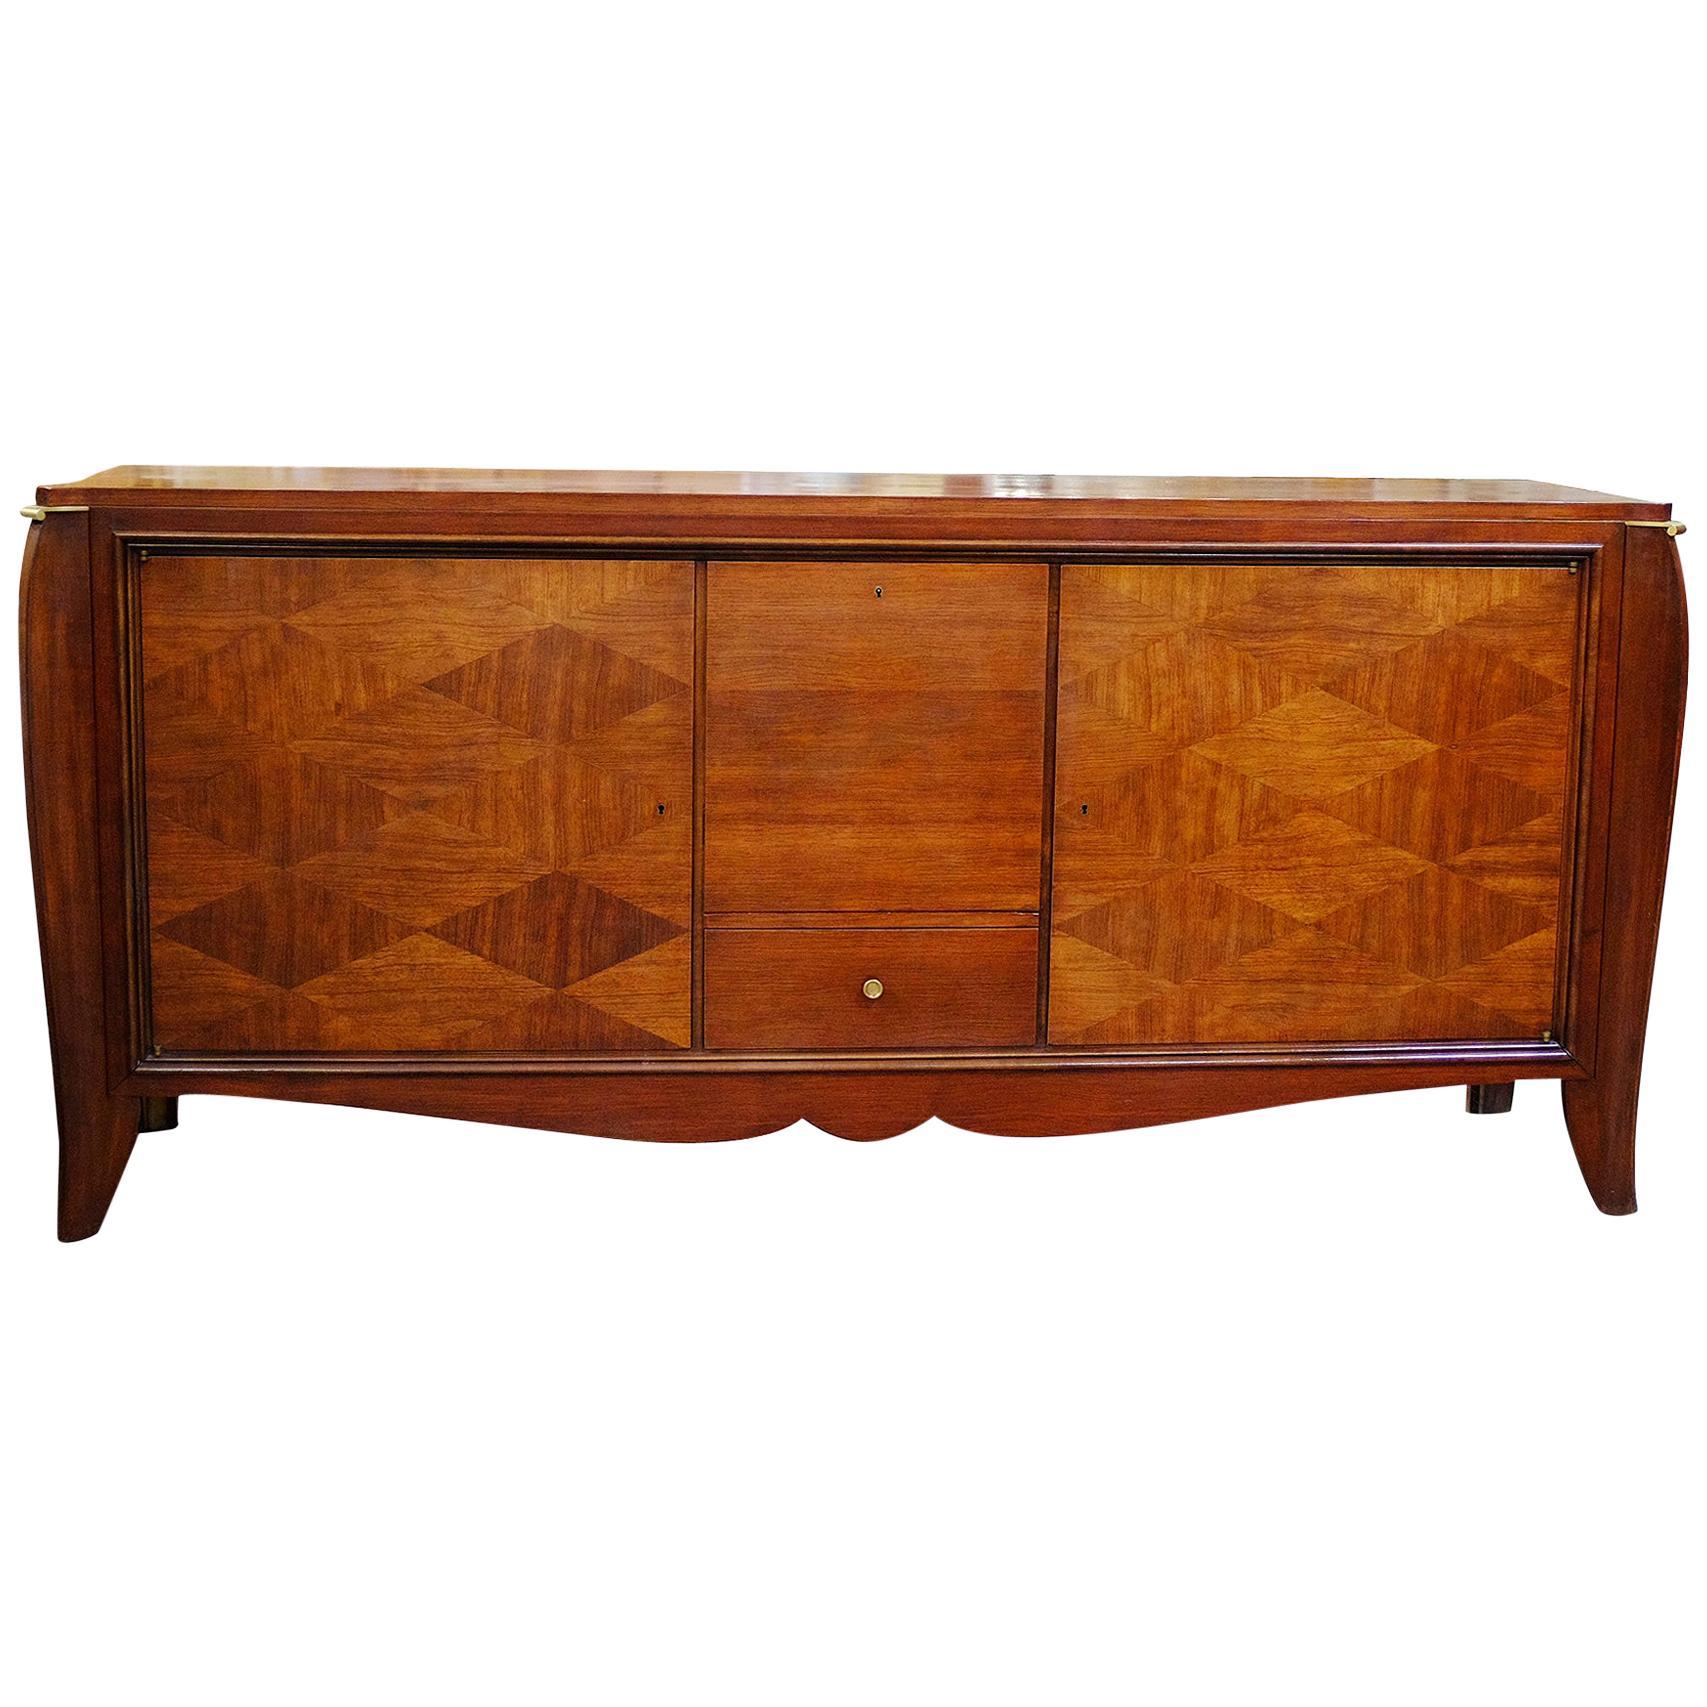 Elegant French Art Deco Sideboard